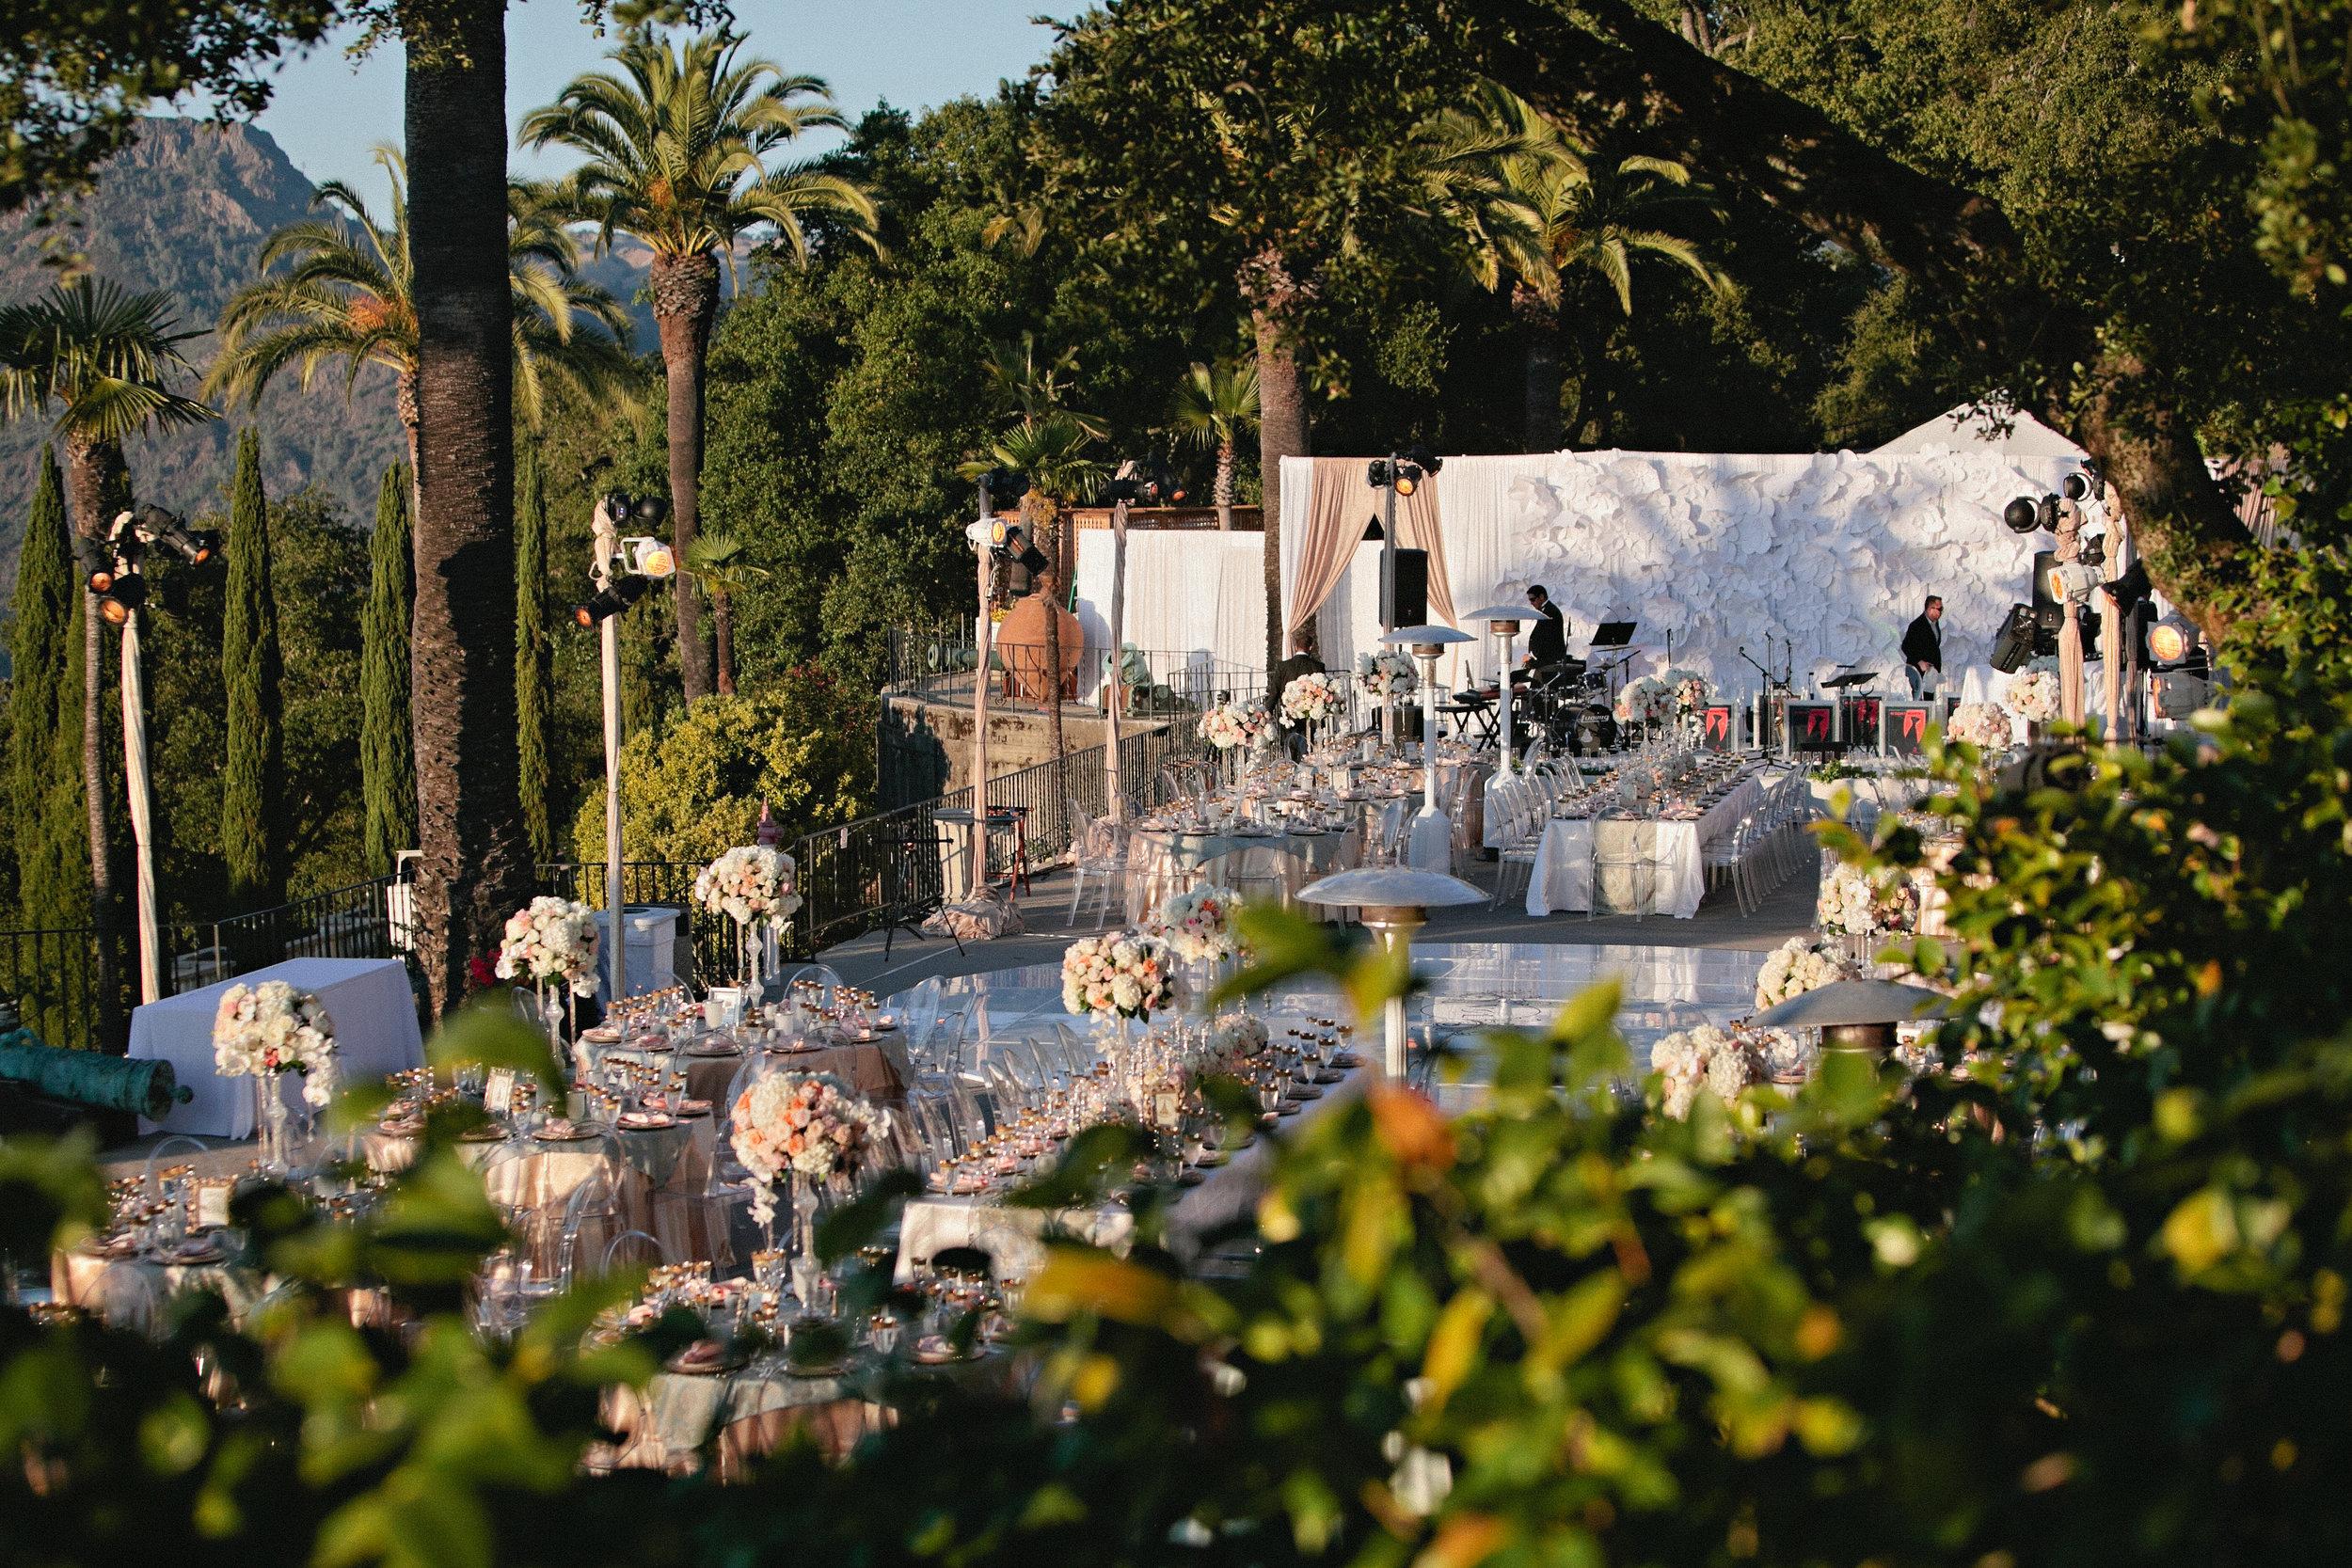 9204_linda_vu_wedding-1617003452-O.jpg